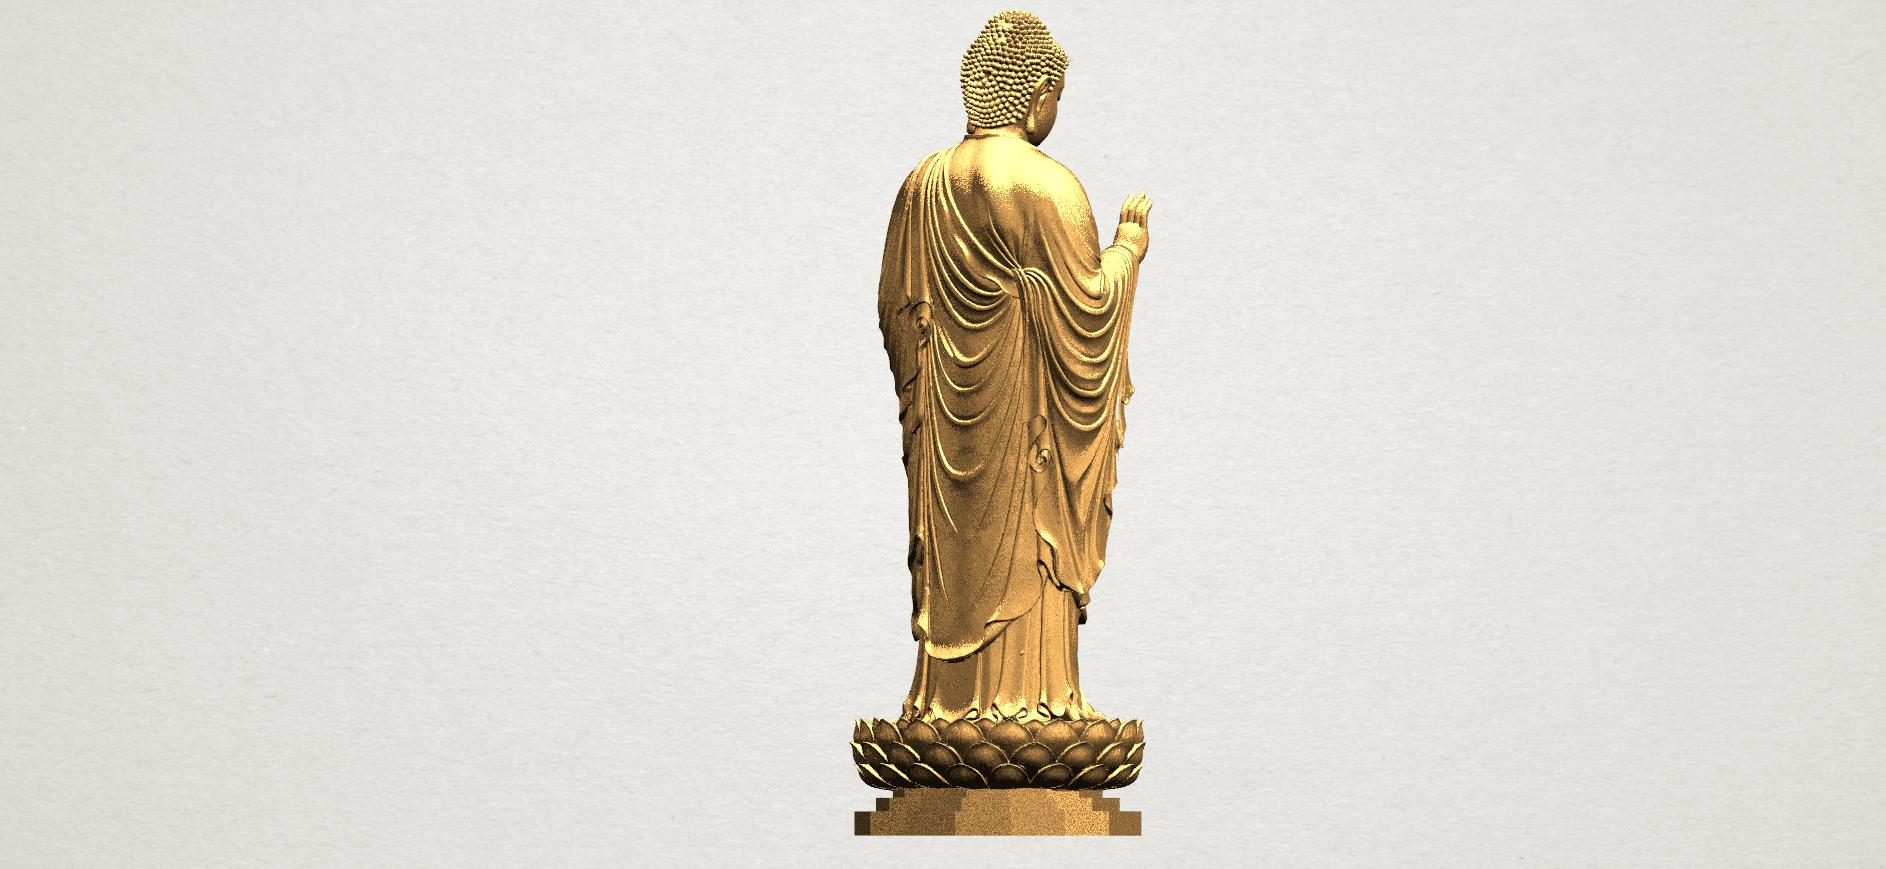 Gautama Buddha Standing (ii) A06.png Download free STL file Gautama Buddha Standing 02 • 3D printer design, GeorgesNikkei